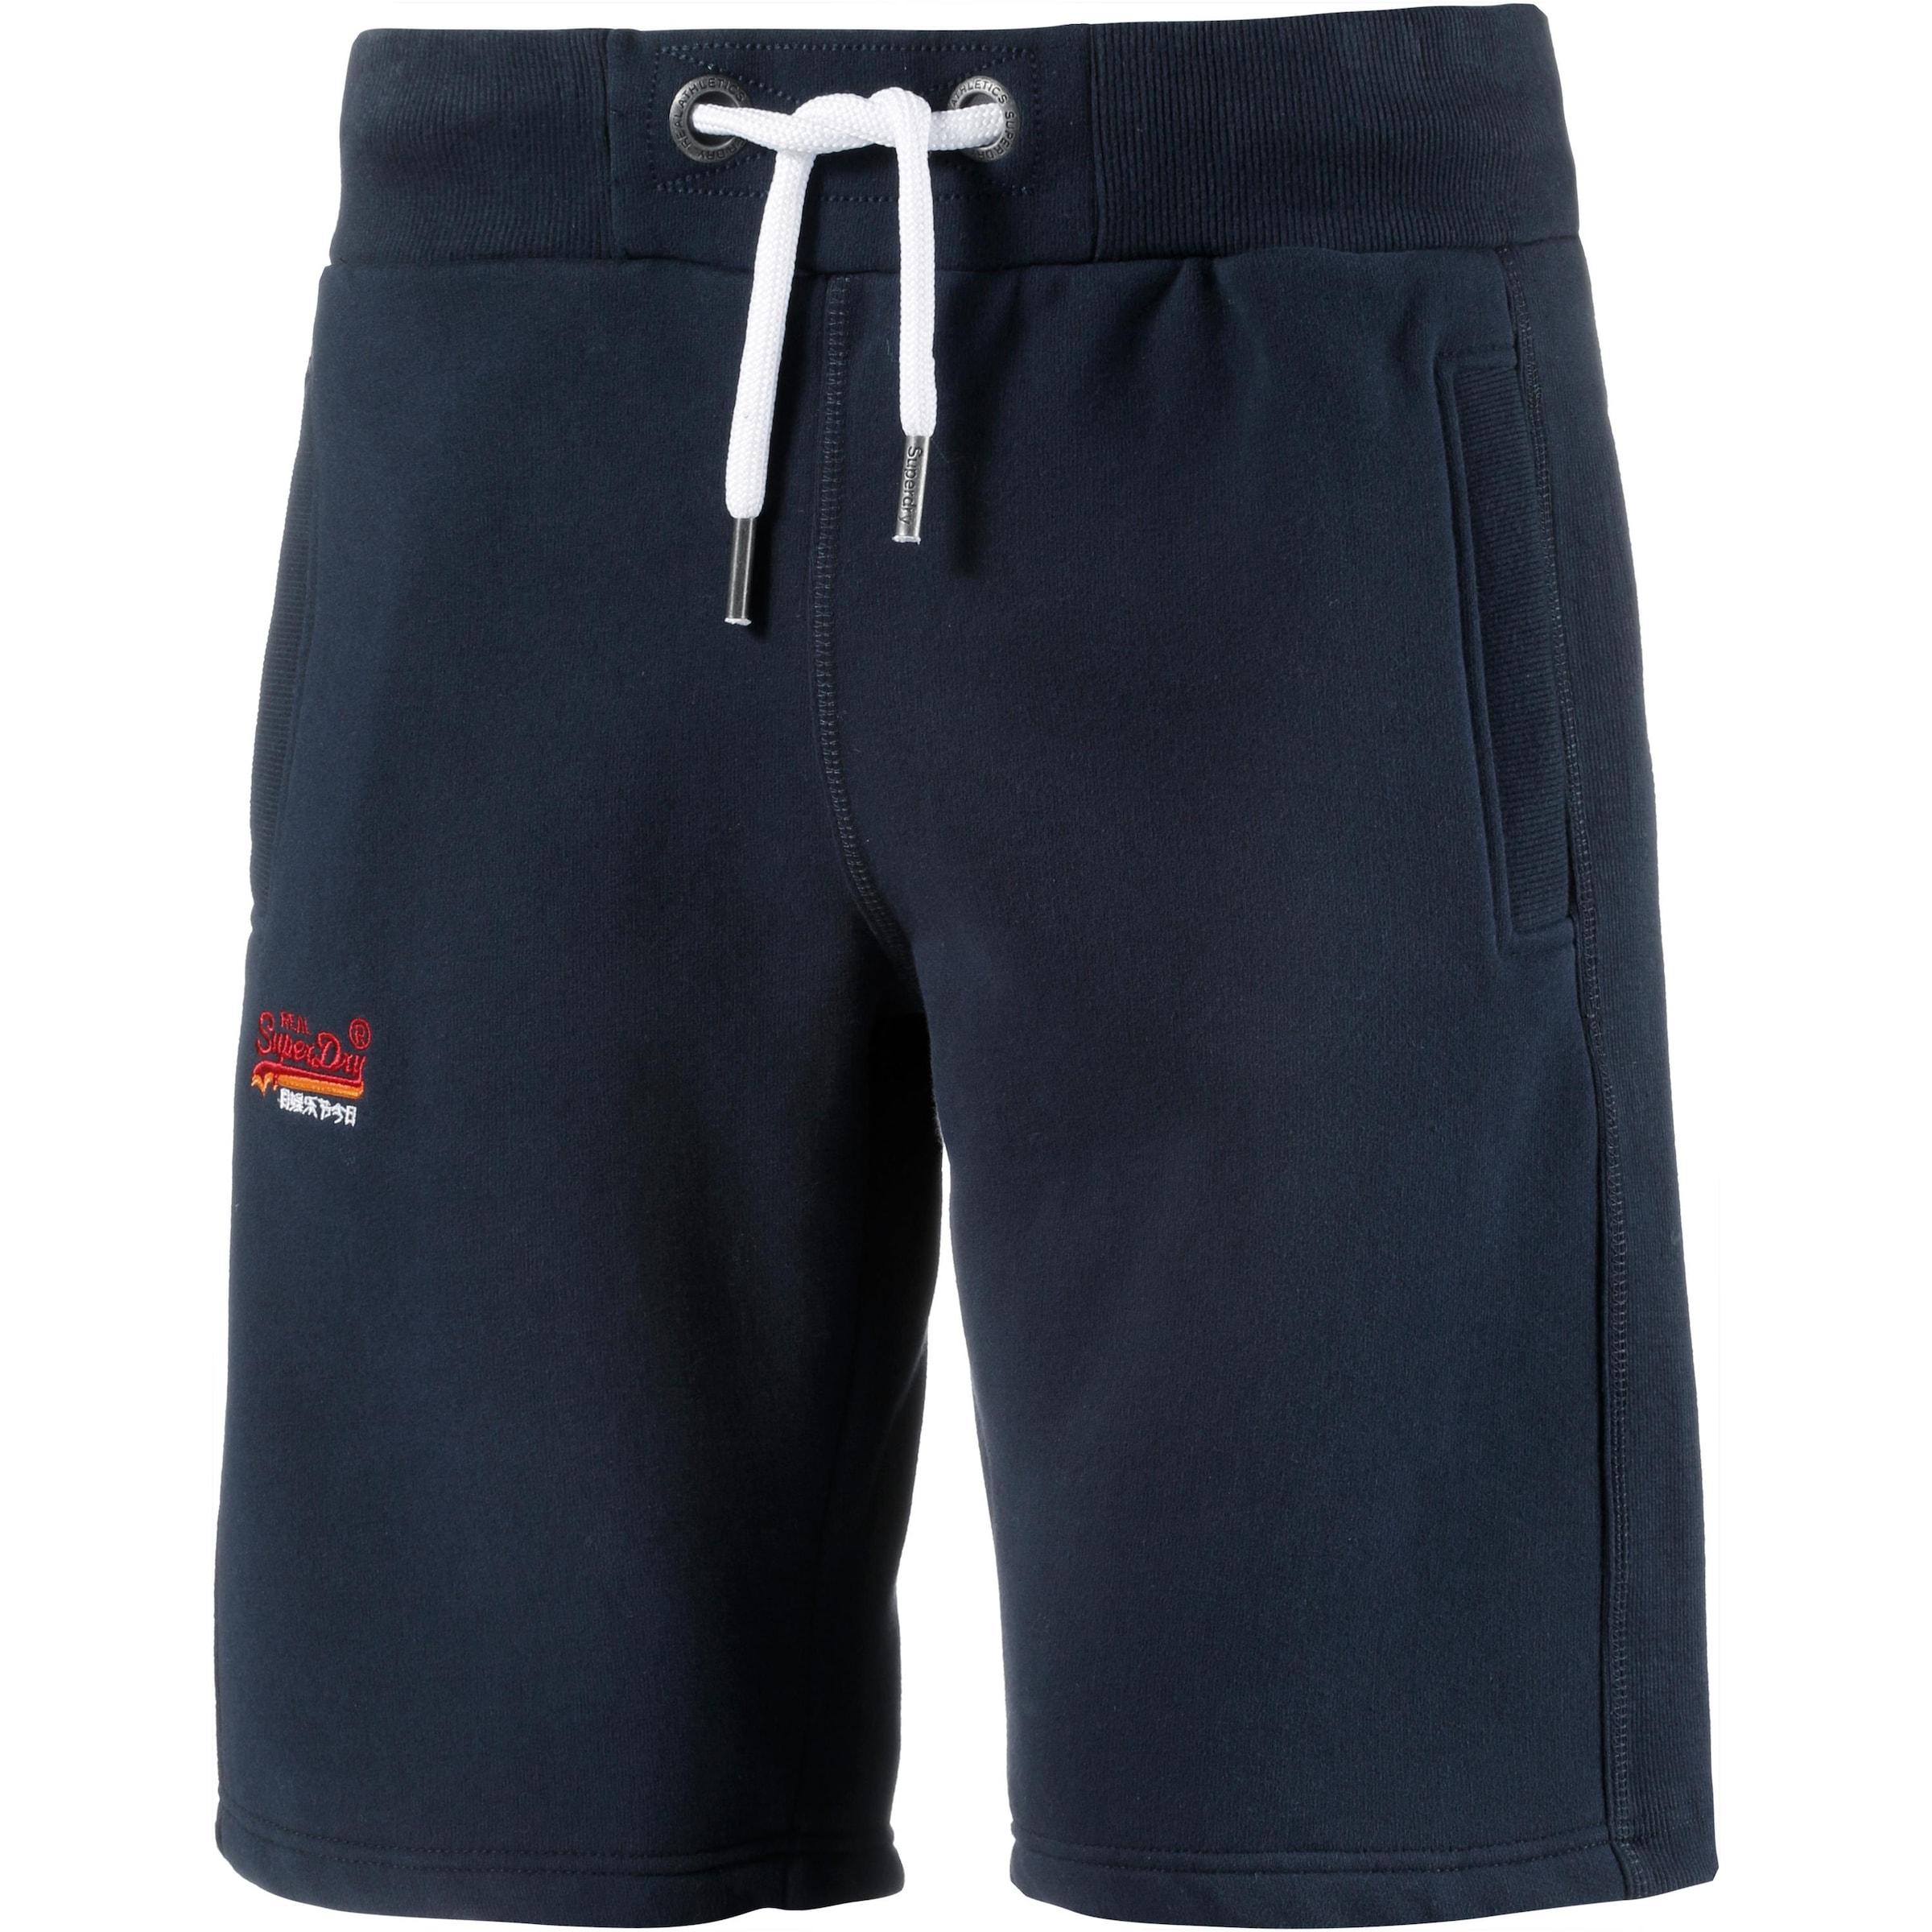 Superdry Shorts Rabatt 100% Original Bester Ort hcZrLEI